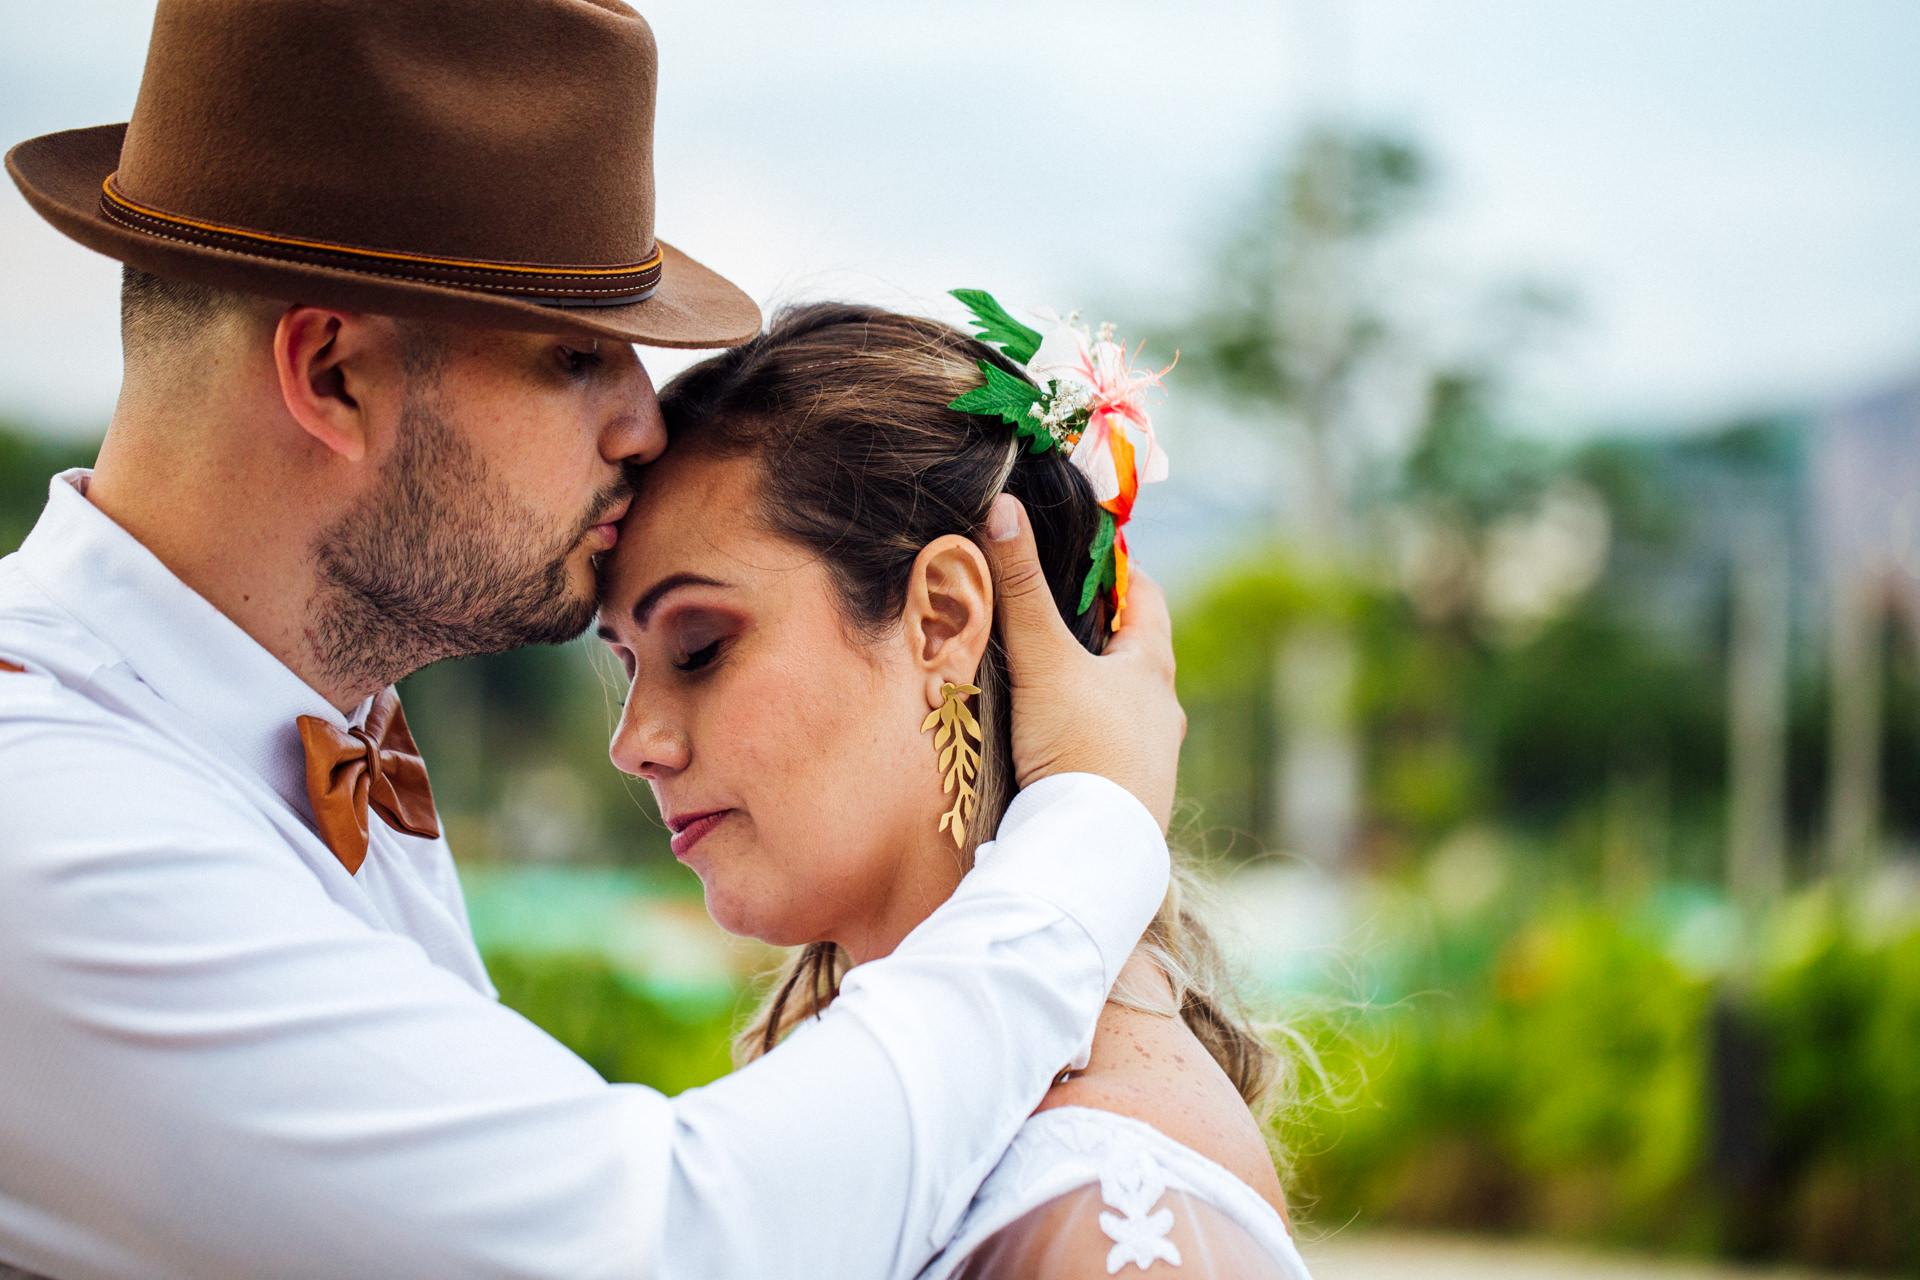 Wedding-Boda-Matrimonio-Fotografo-Fotografia-bodas-Medellin-Llanogrande-Colombia-Bogota-Cartagena-Miami-Wed-Destination-Photojournalism (180).JPG